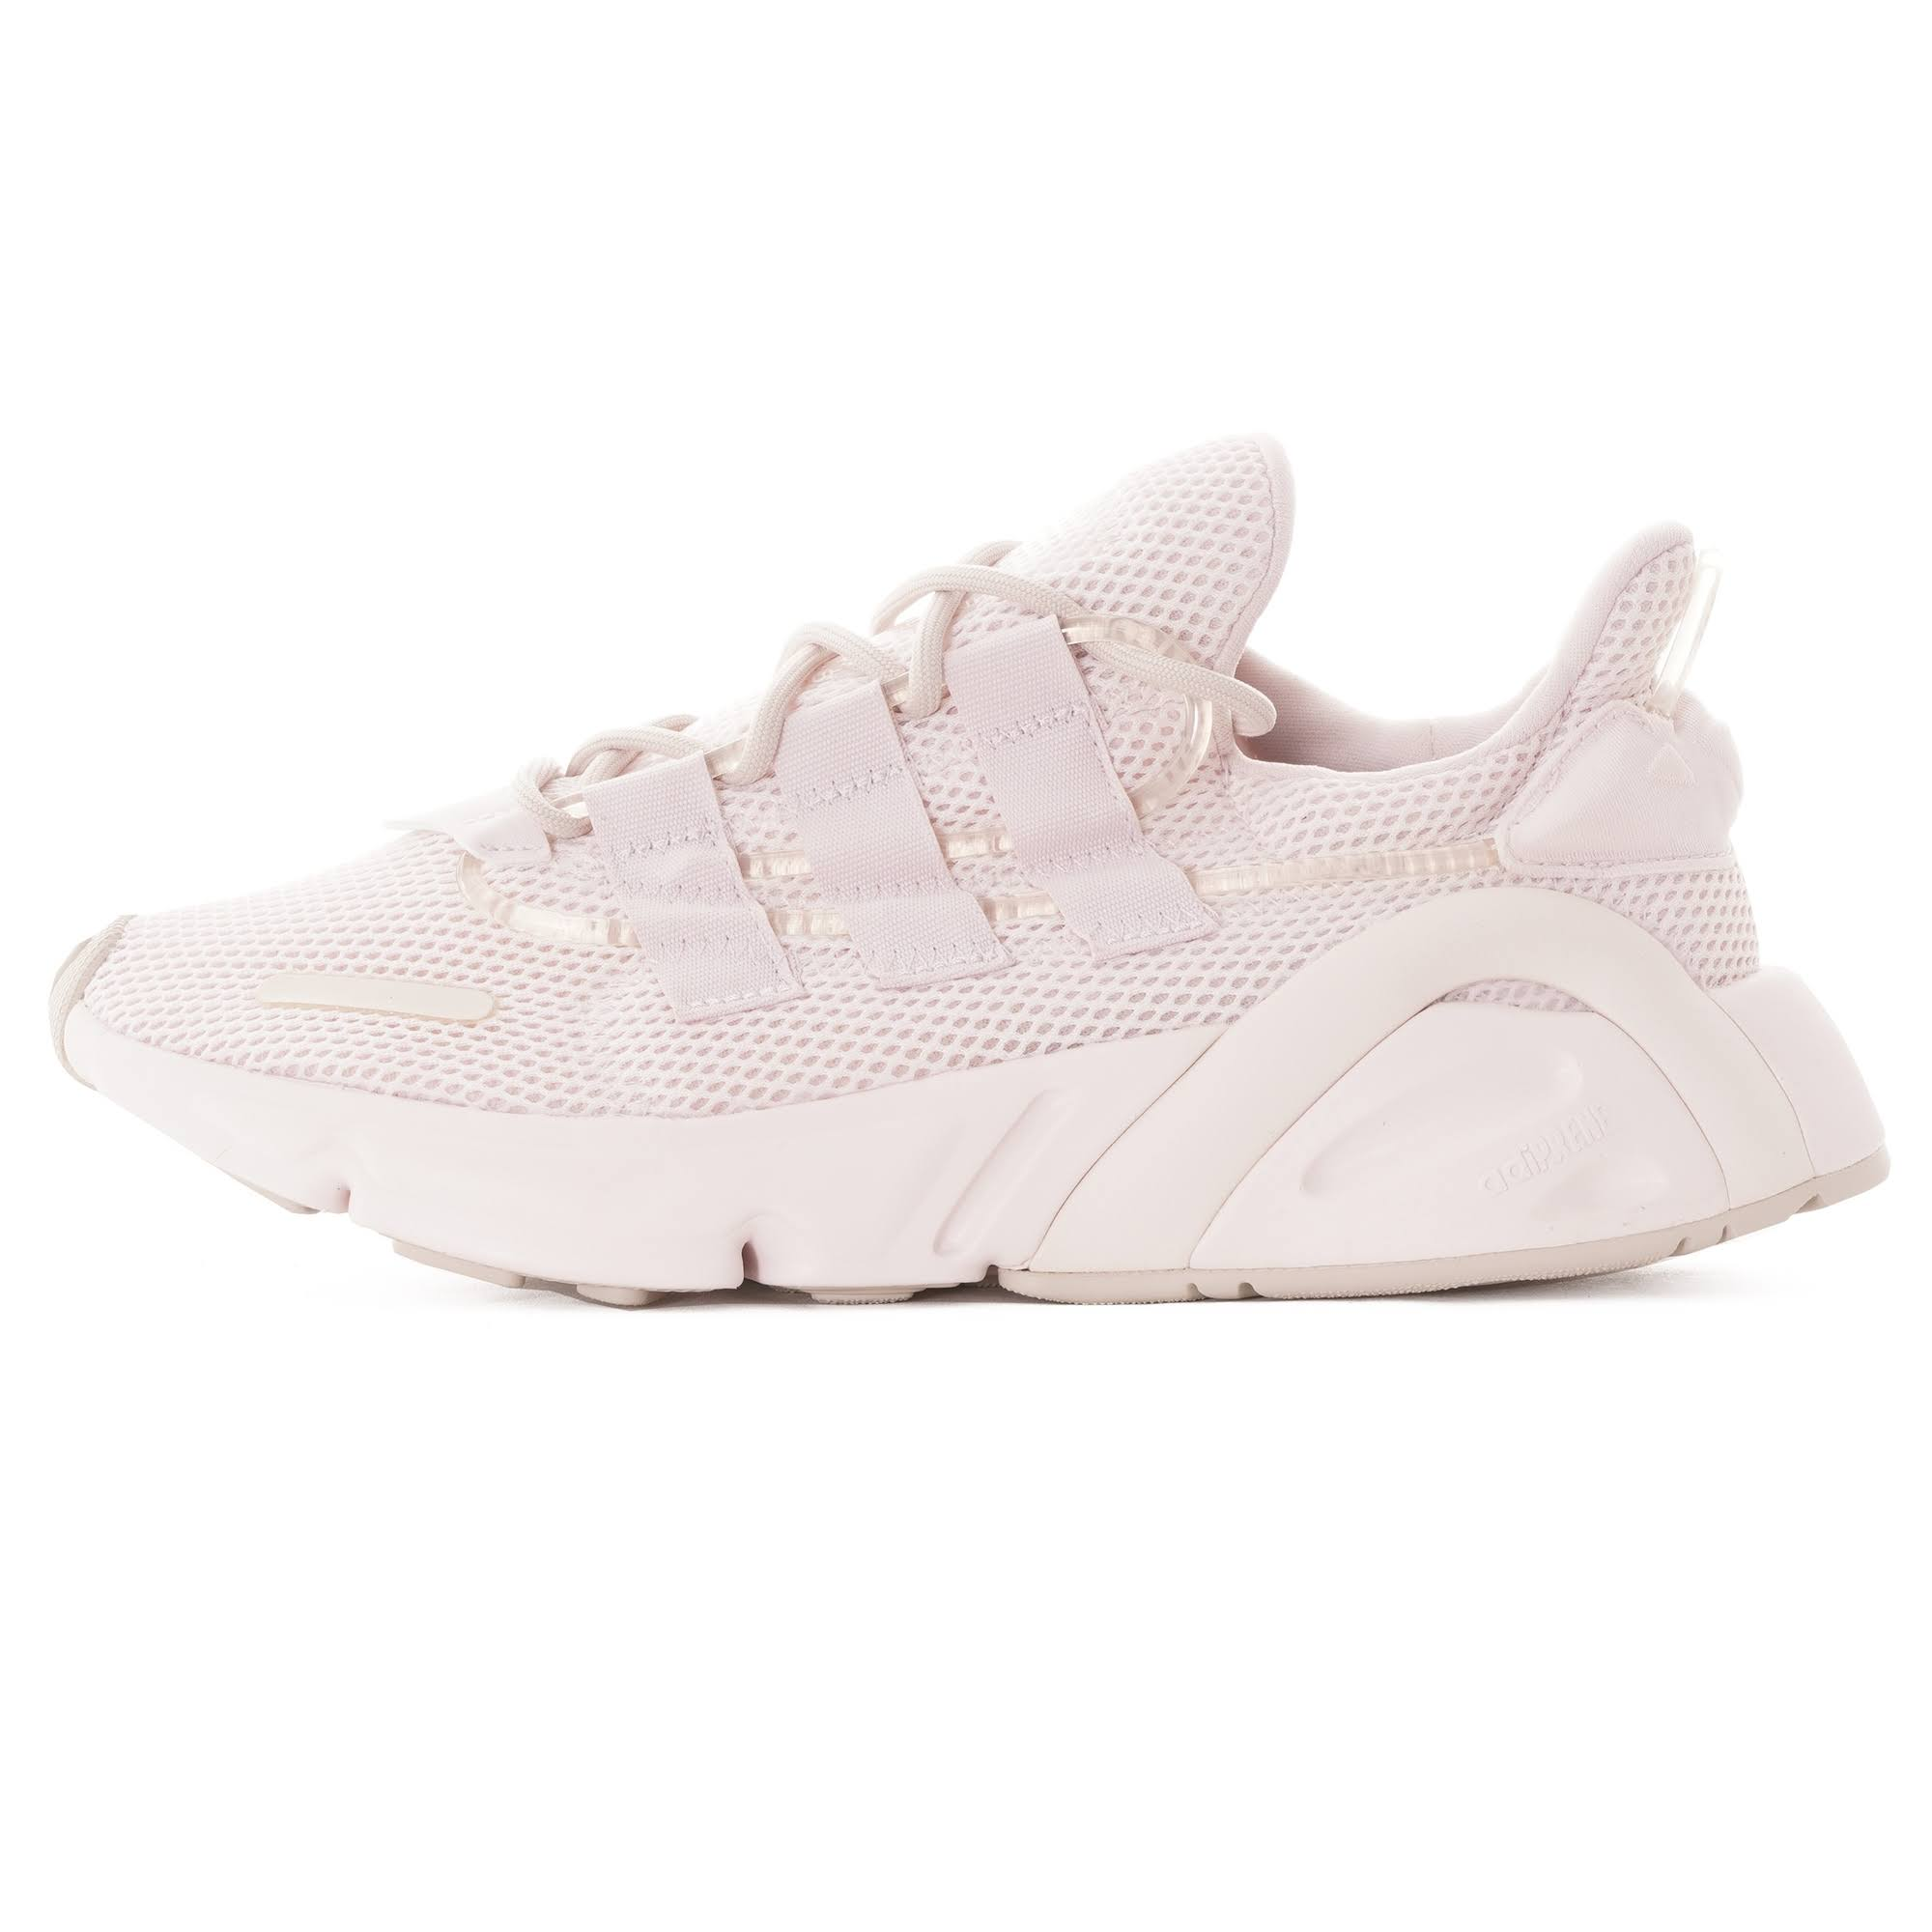 Adidas LXCON Shoes - Mens - Fuchsia